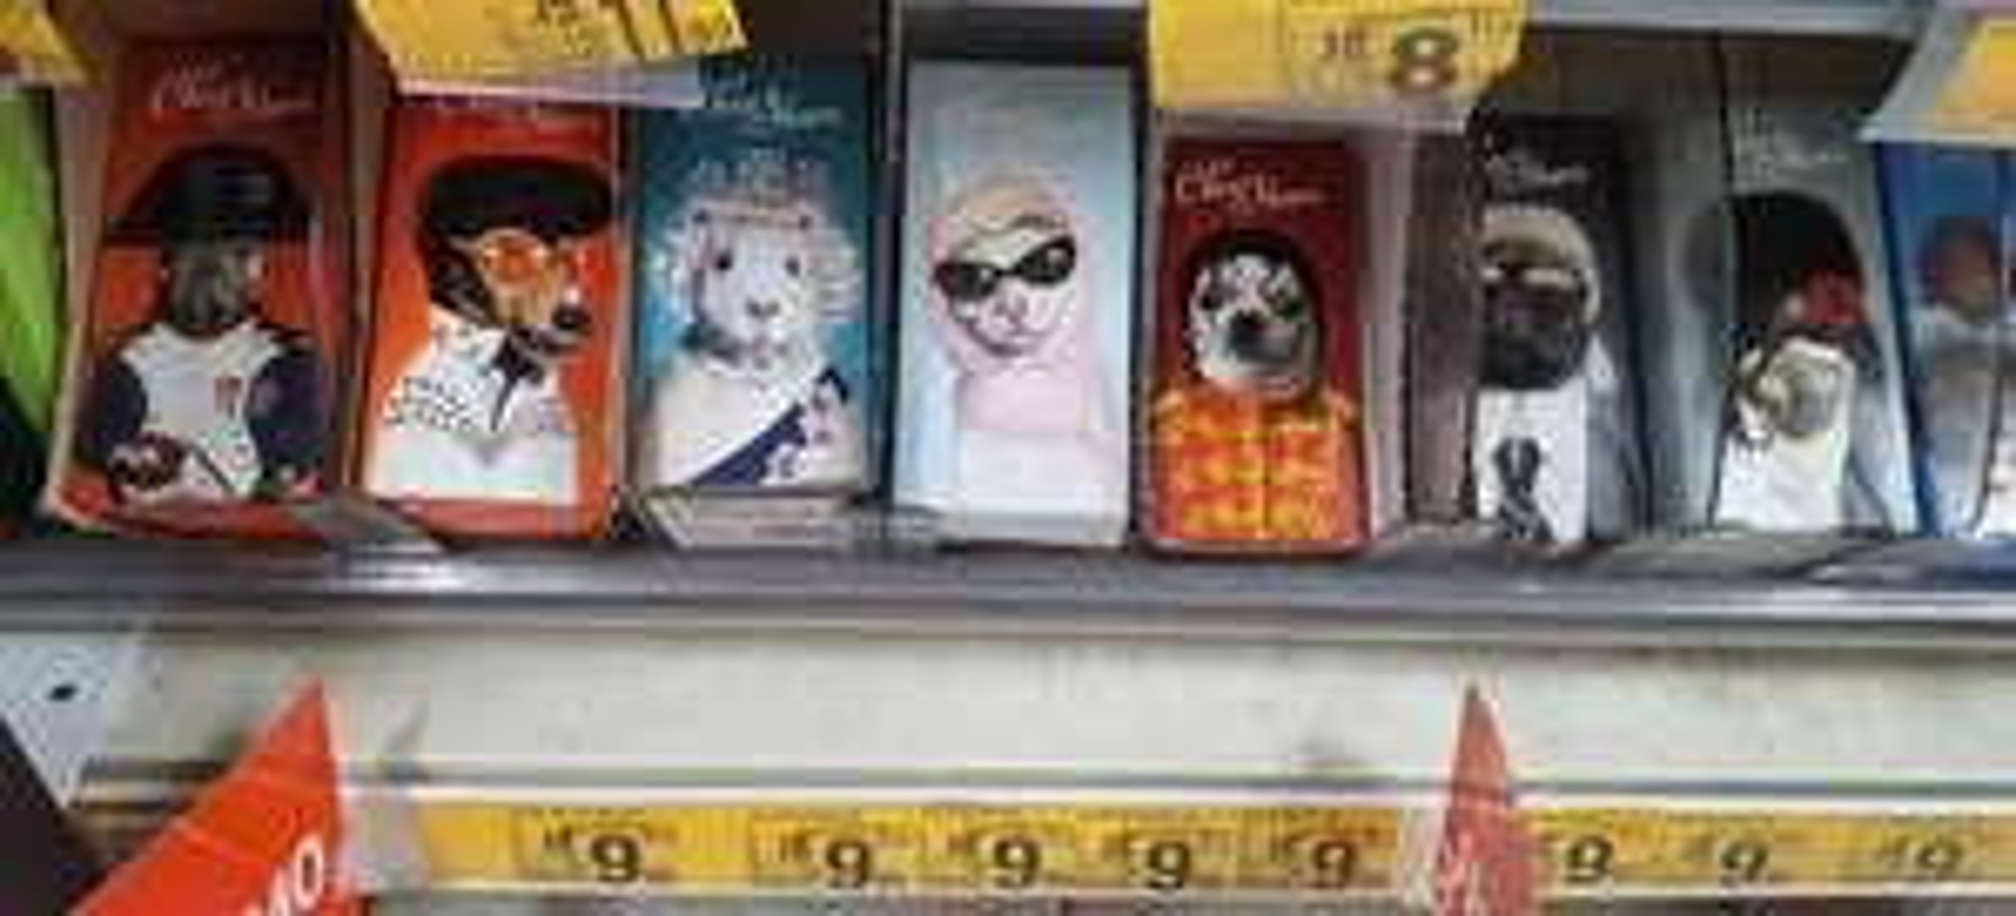 Czekolada ChocStars Auchan Gliwice